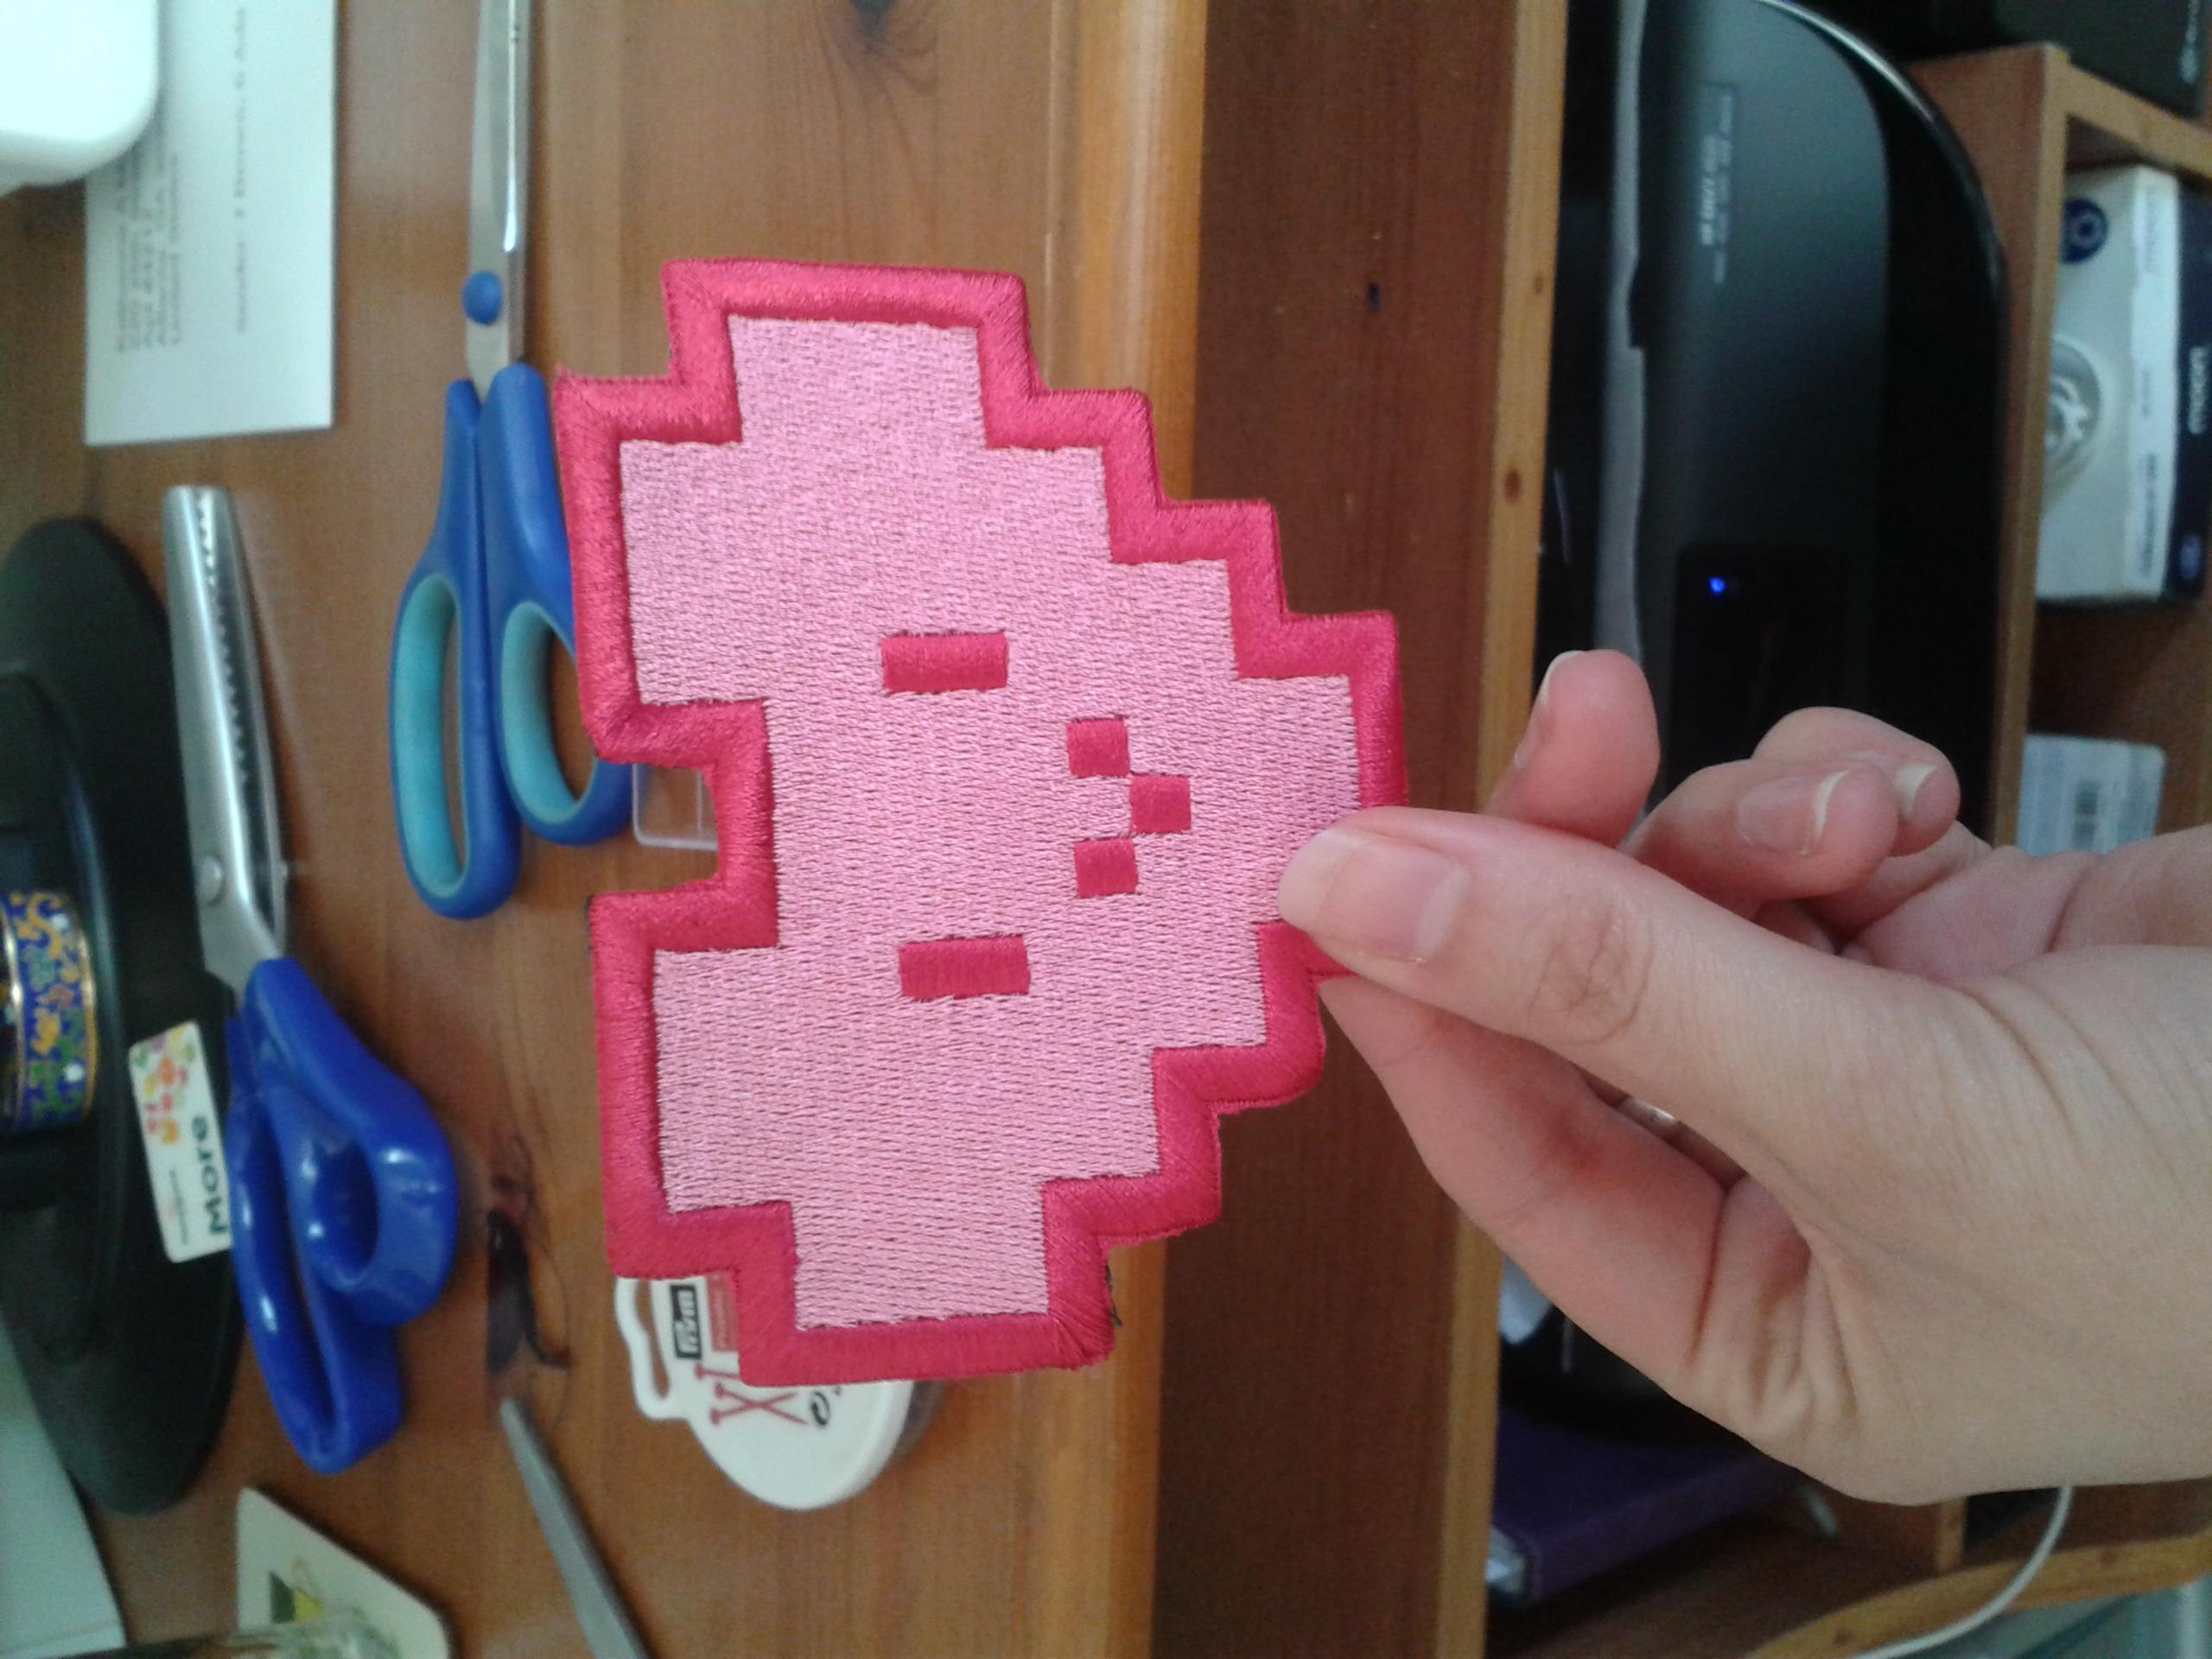 League of Legends pixel heart